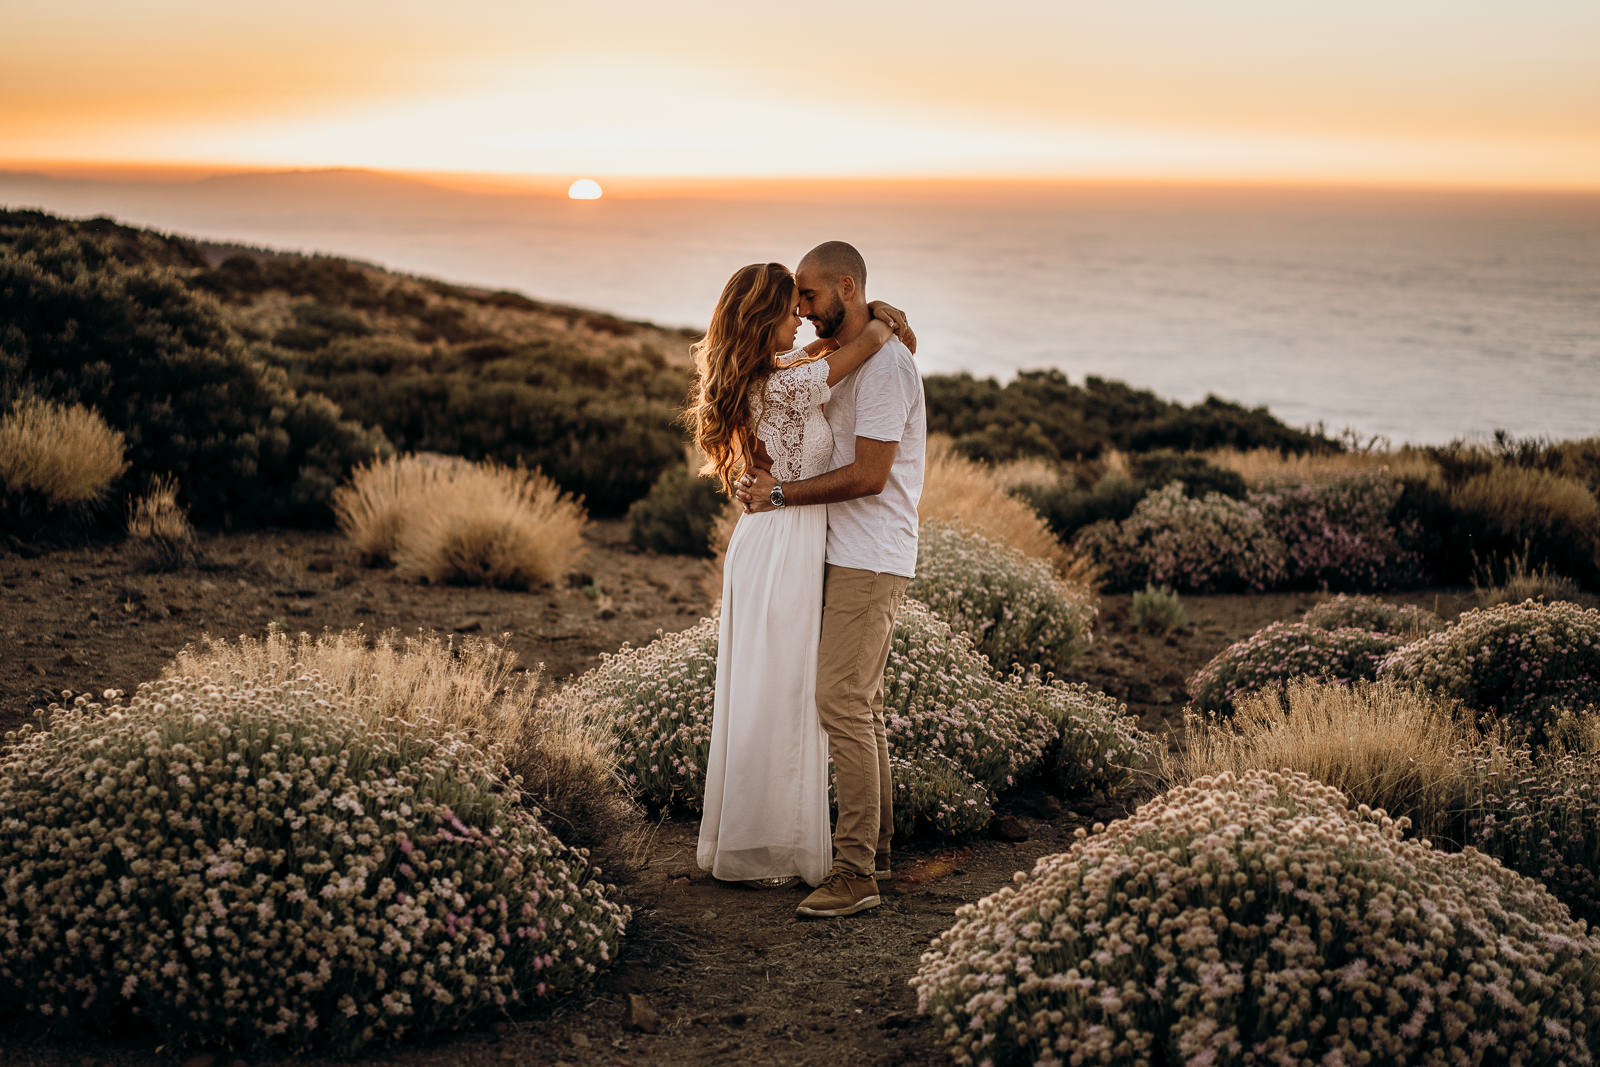 Sunset Shoot on Tenerife by Karina Sowa